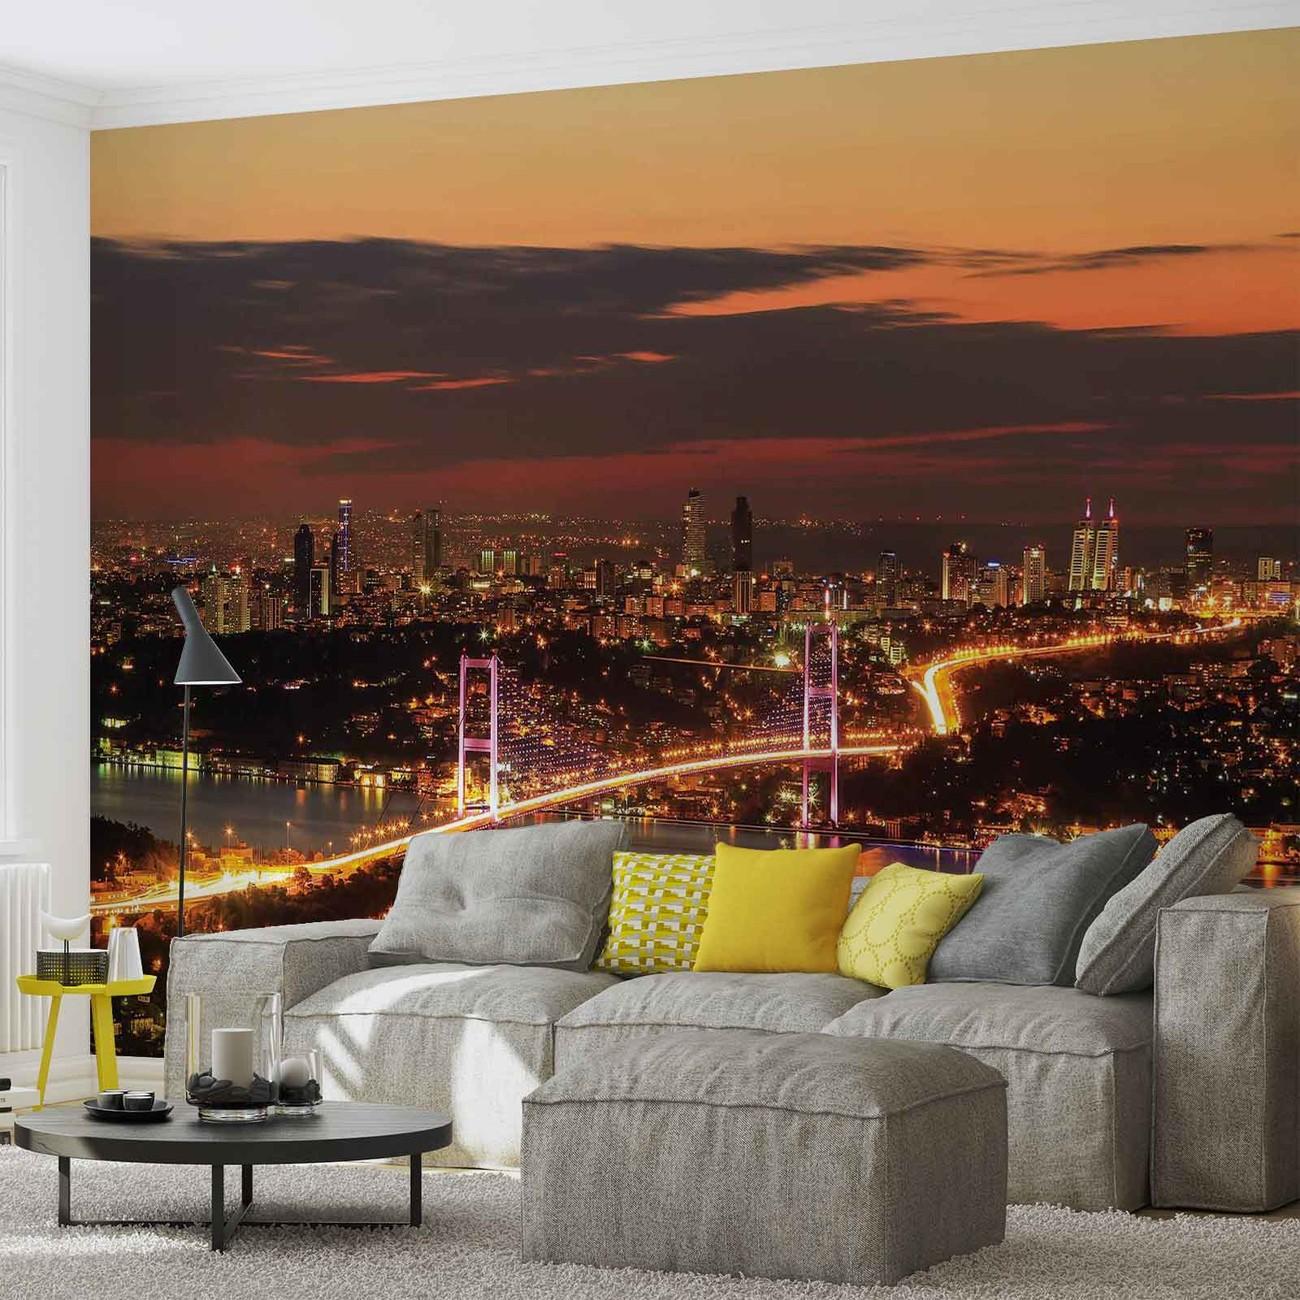 fototapete tapete stadt istanbul skyline bosporus bei europosters kostenloser versand. Black Bedroom Furniture Sets. Home Design Ideas